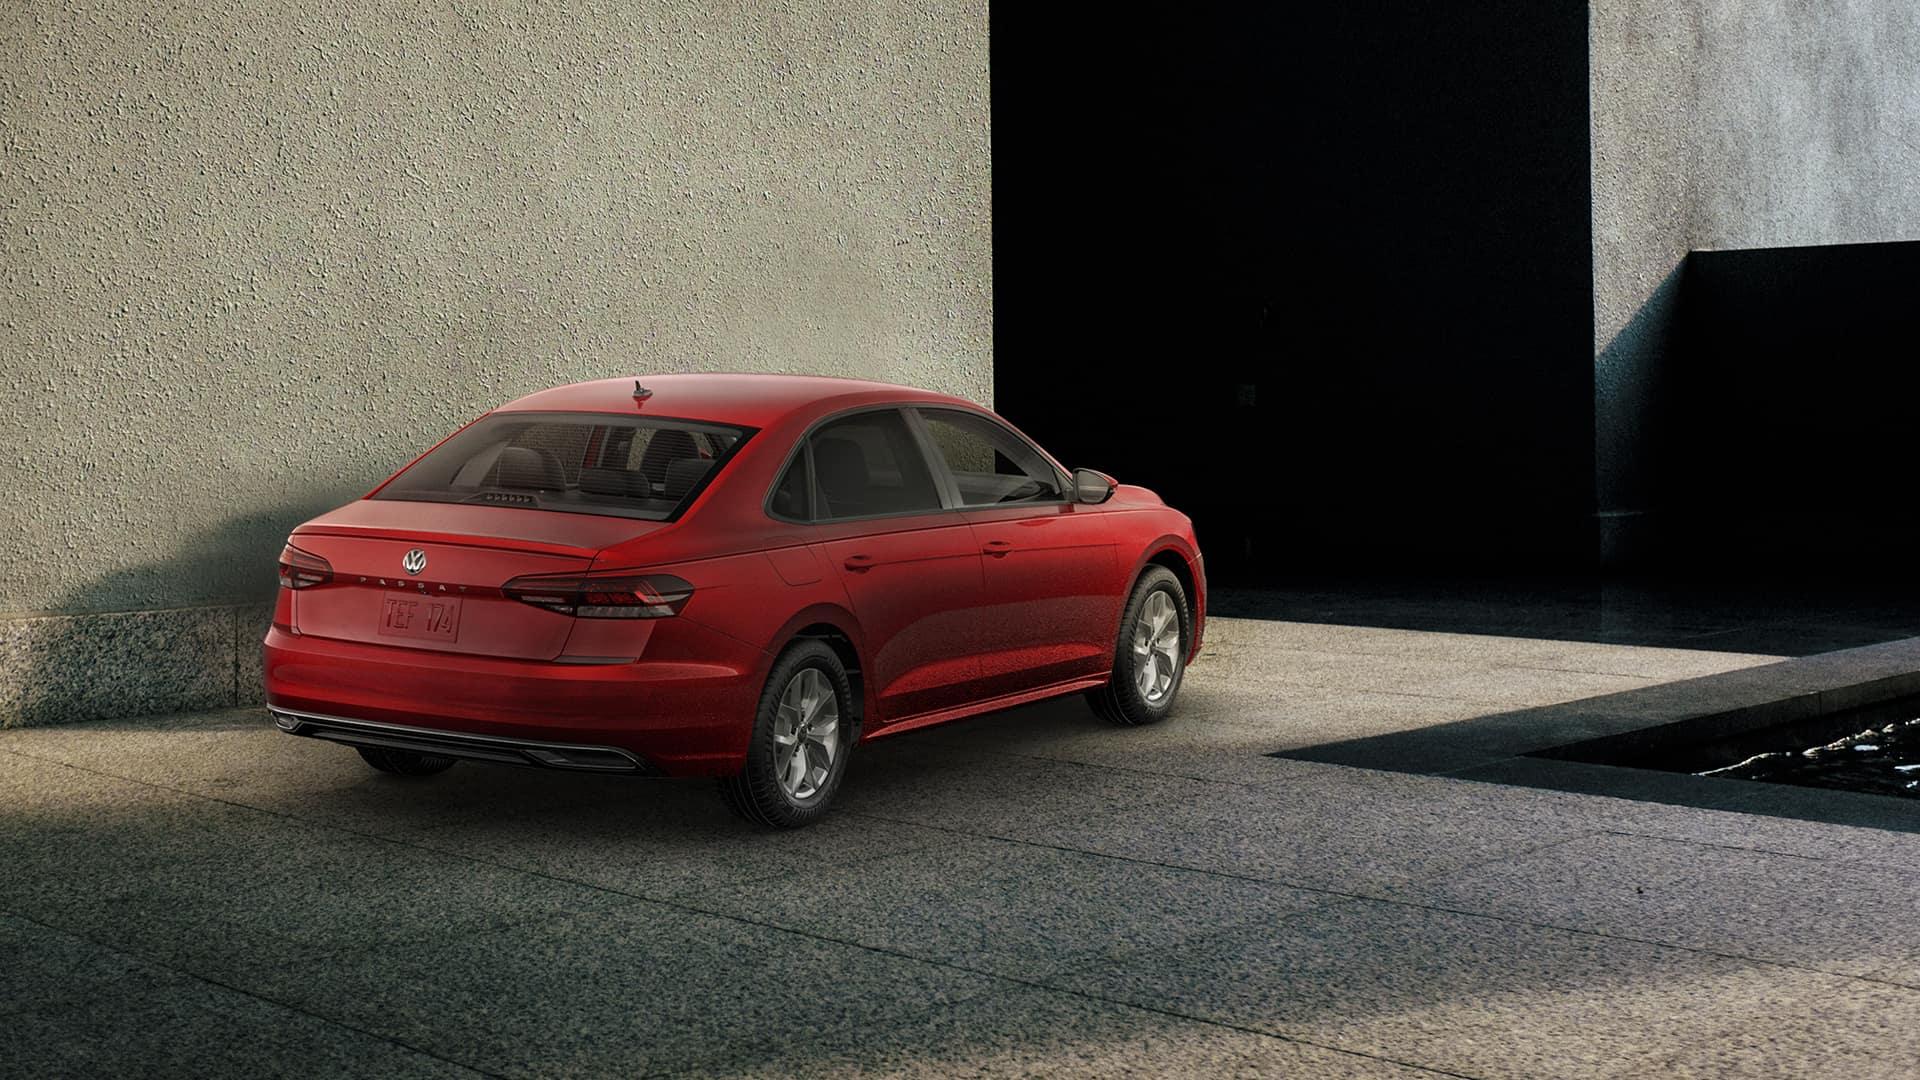 Red VW Passat